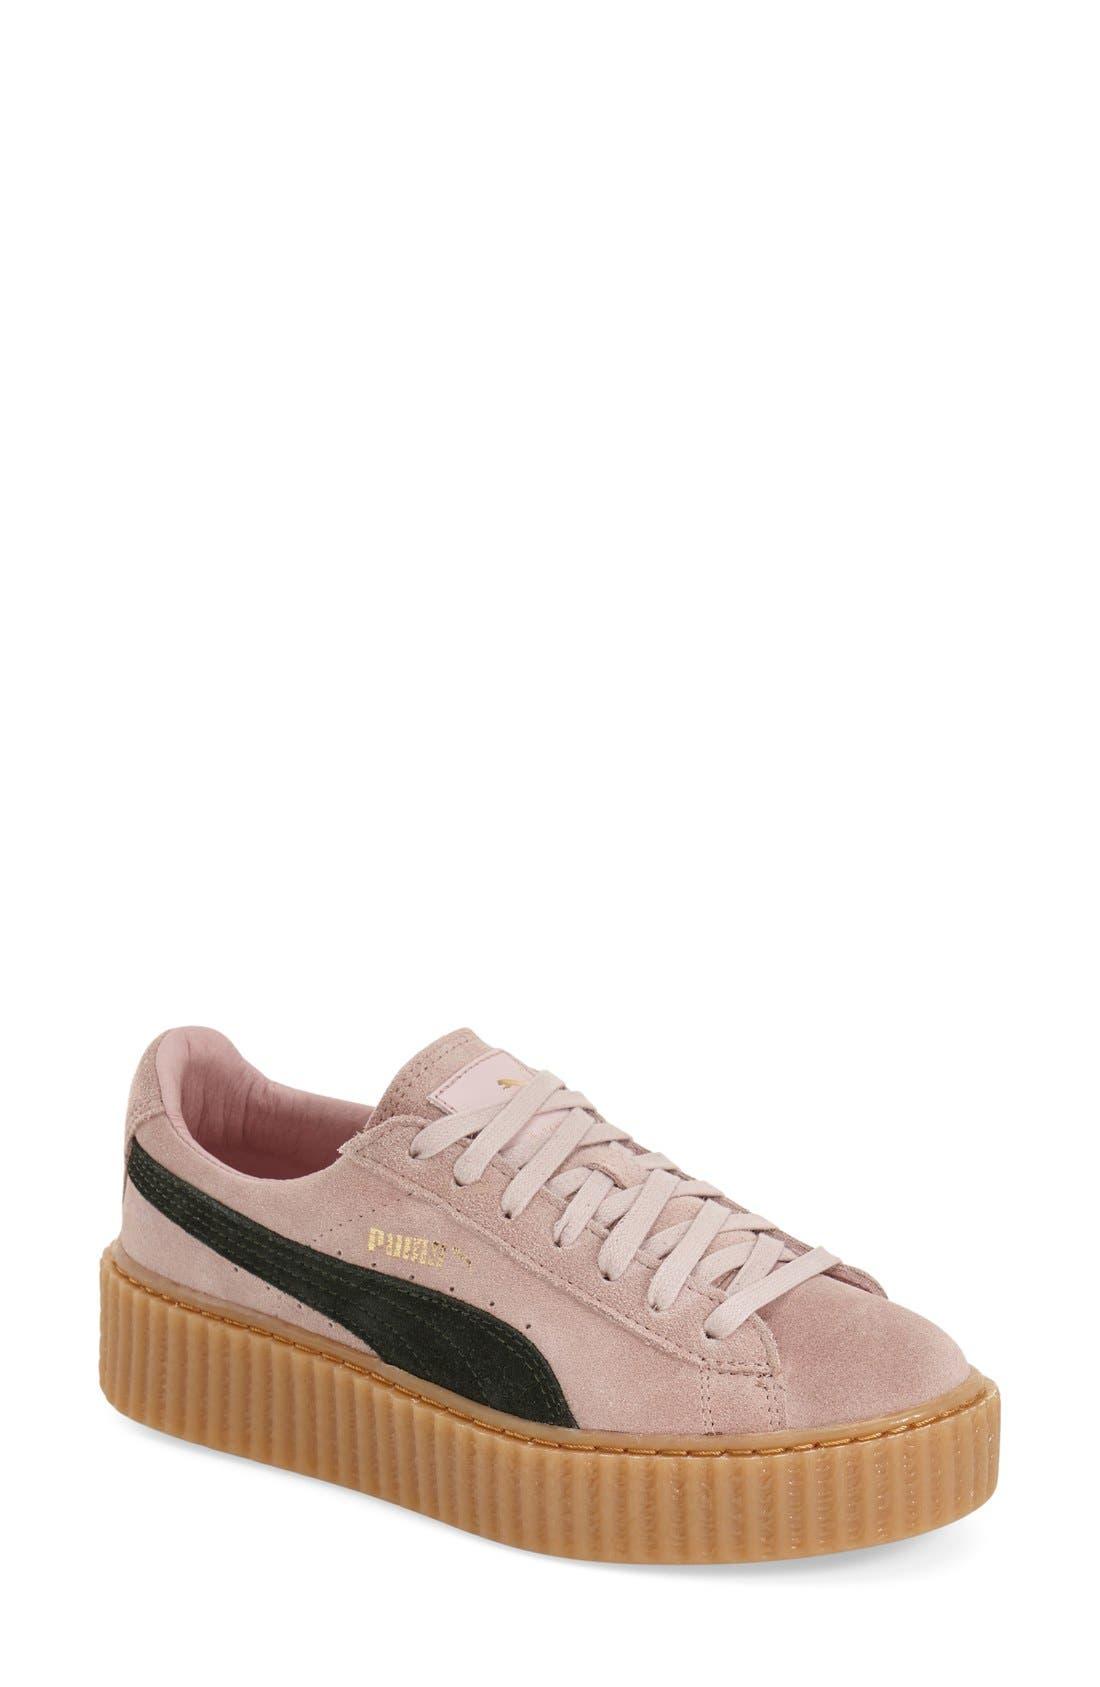 FENTY PUMA by Rihanna Creeper Sneaker,                             Main thumbnail 13, color,